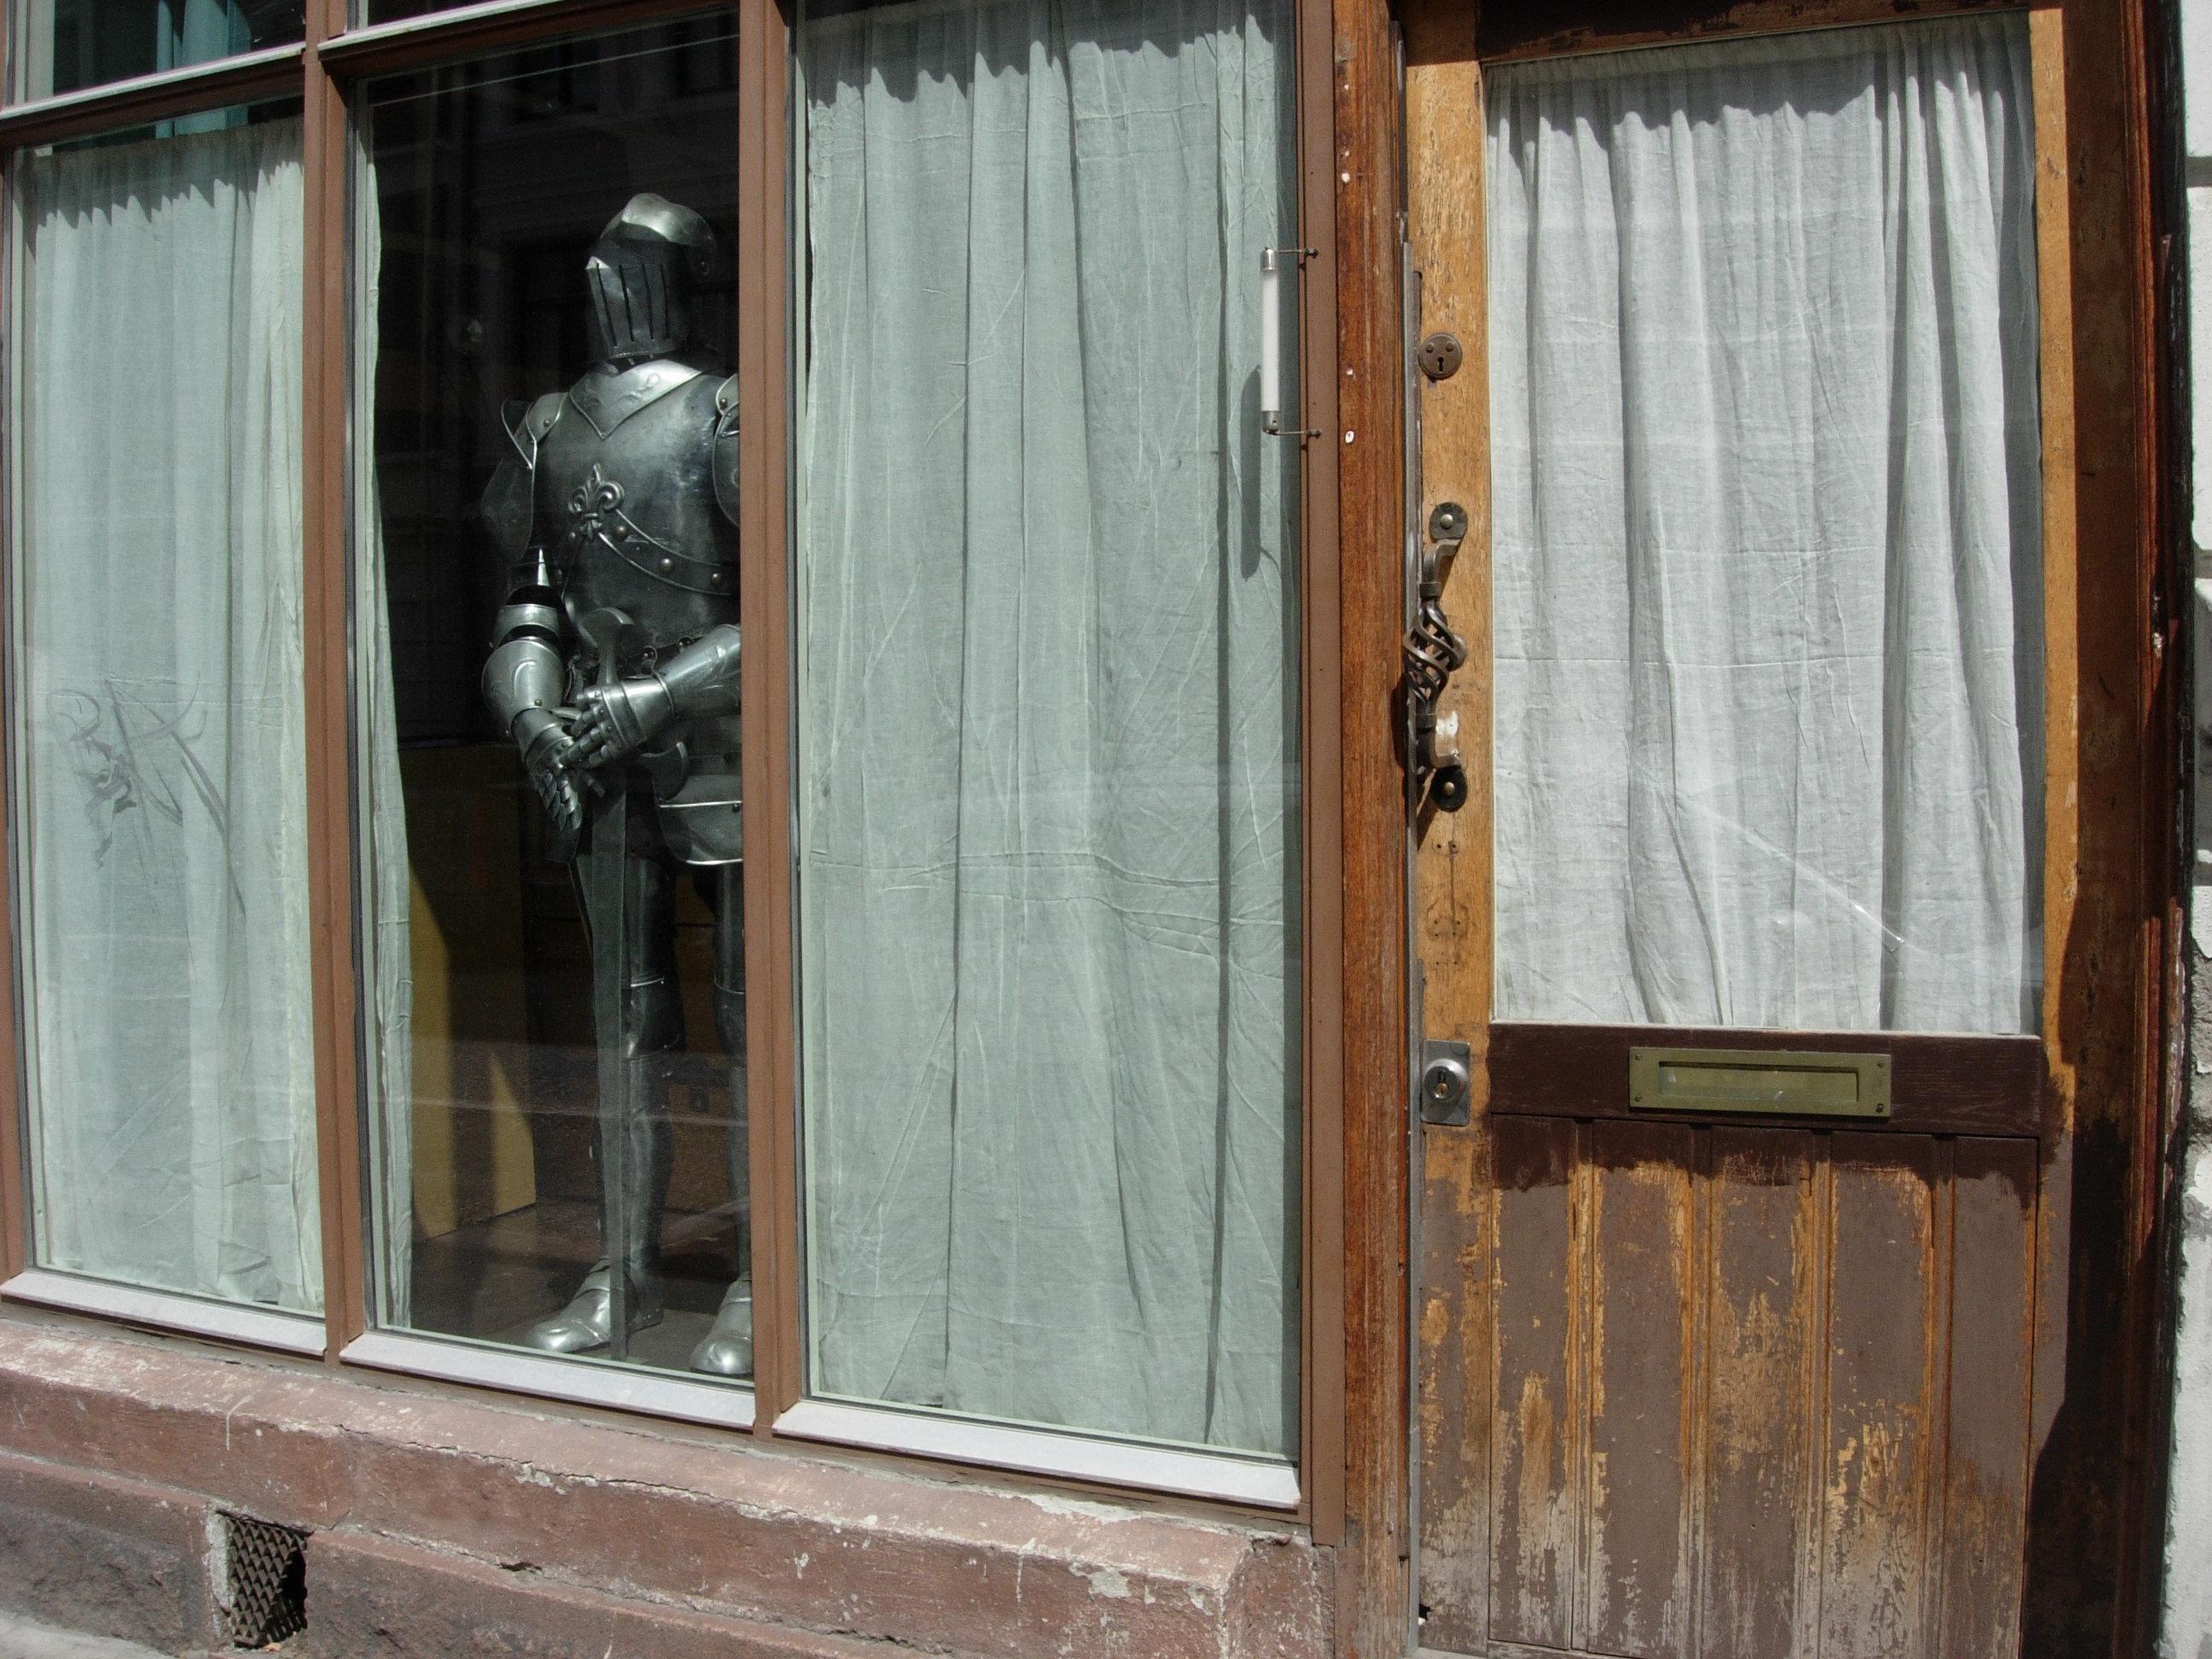 (PP 95: Baktruppen office window with armor)